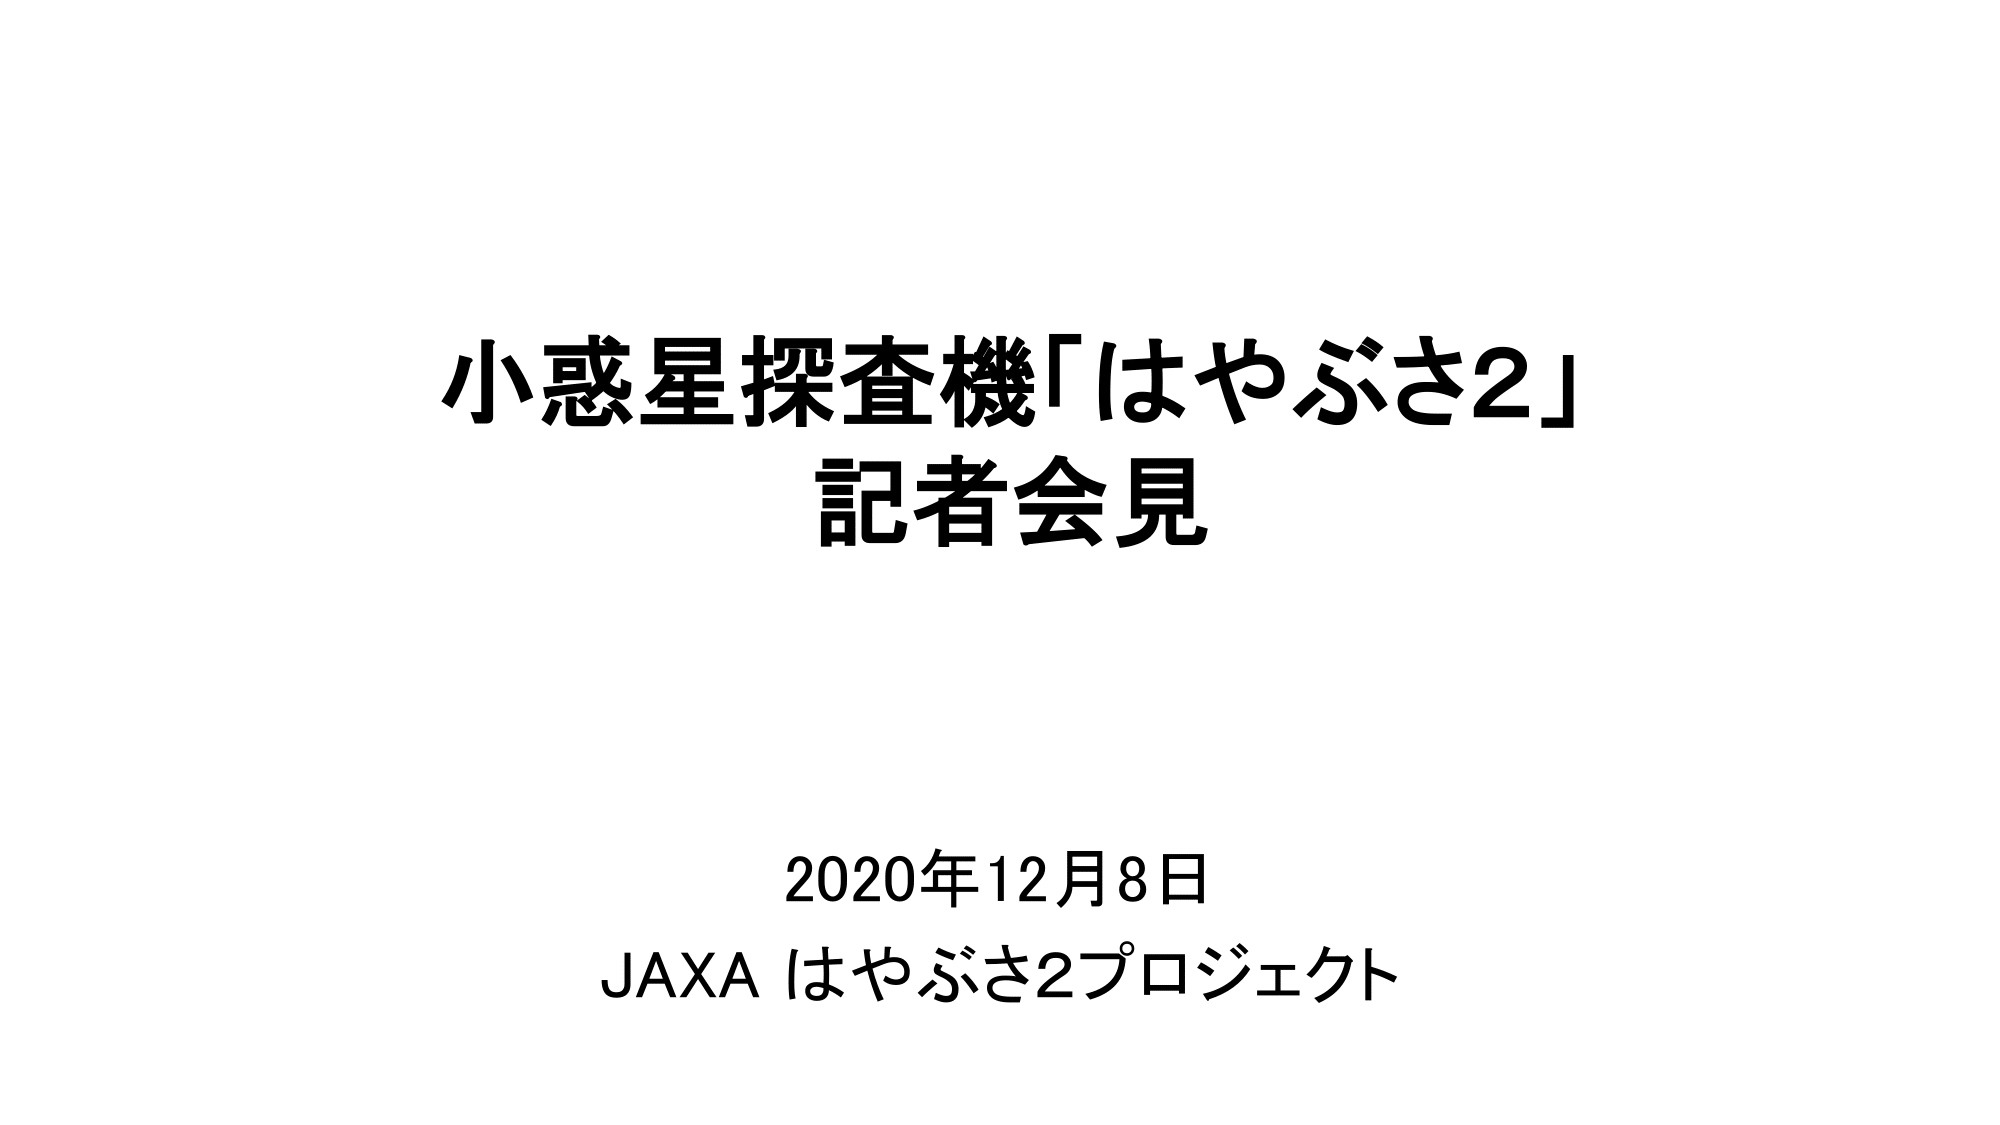 f:id:Imamura:20201208122156p:plain